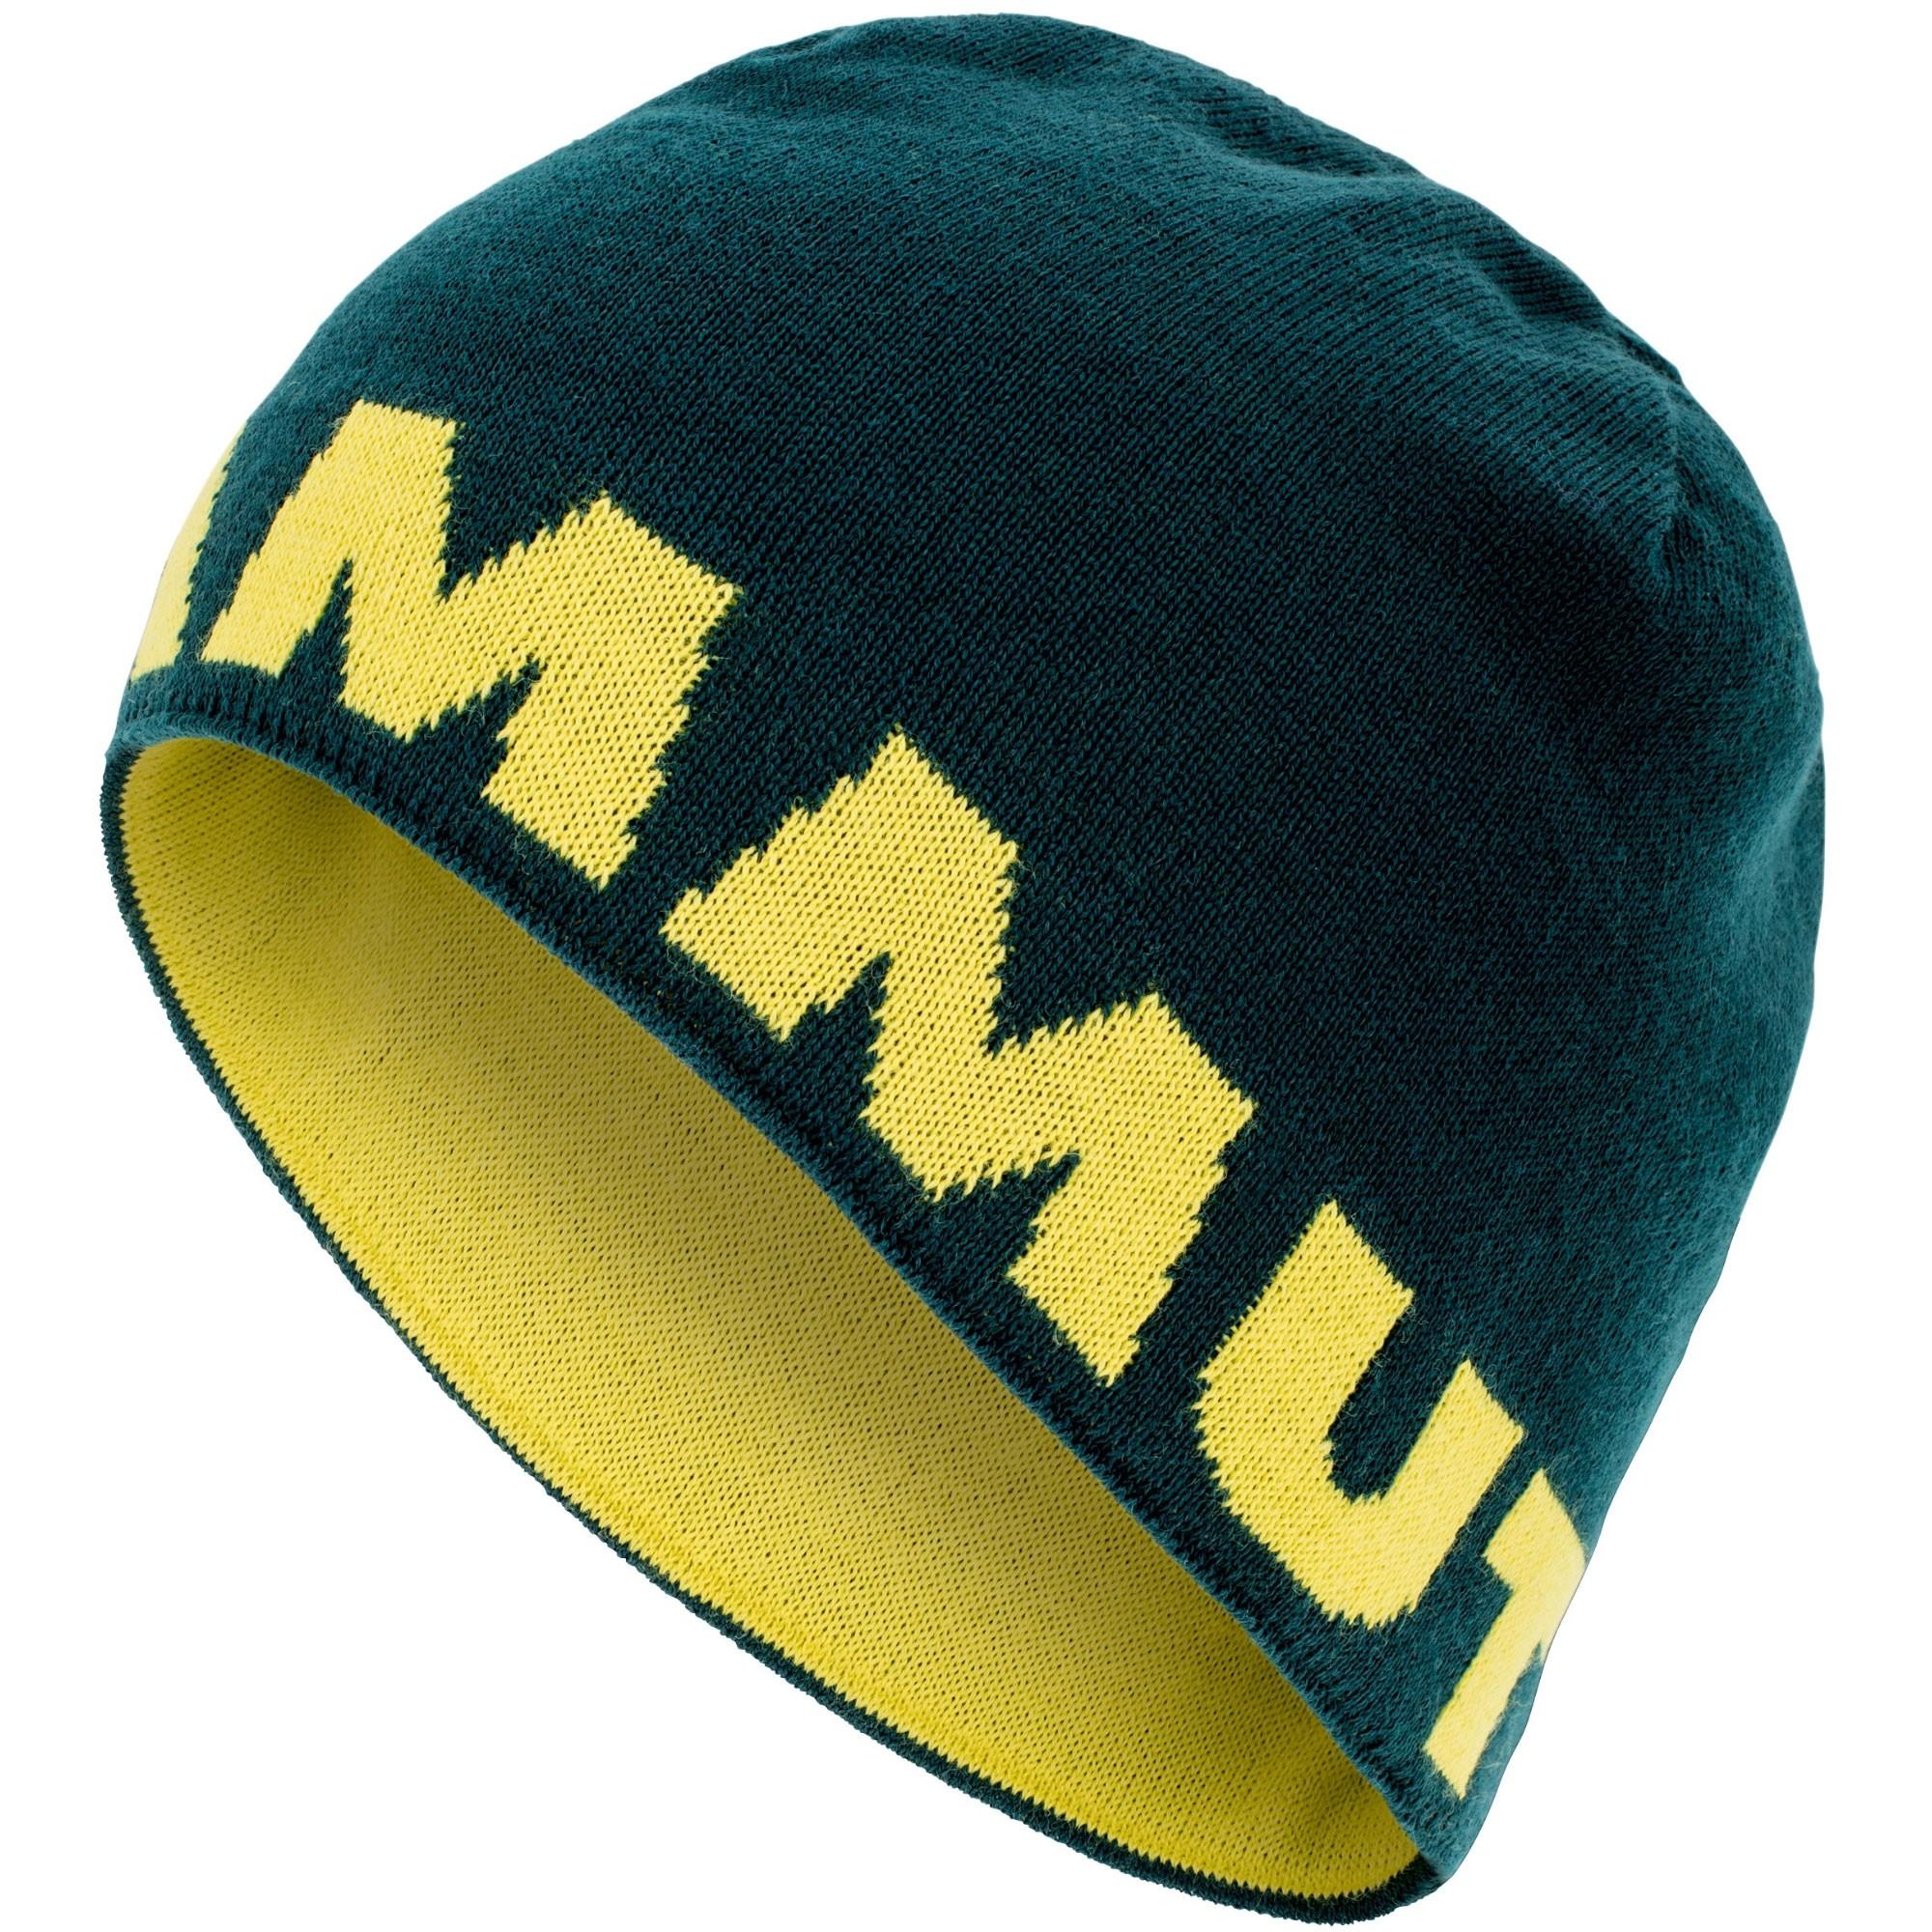 Mammut Logo Beanie - Dark Teal/Canary